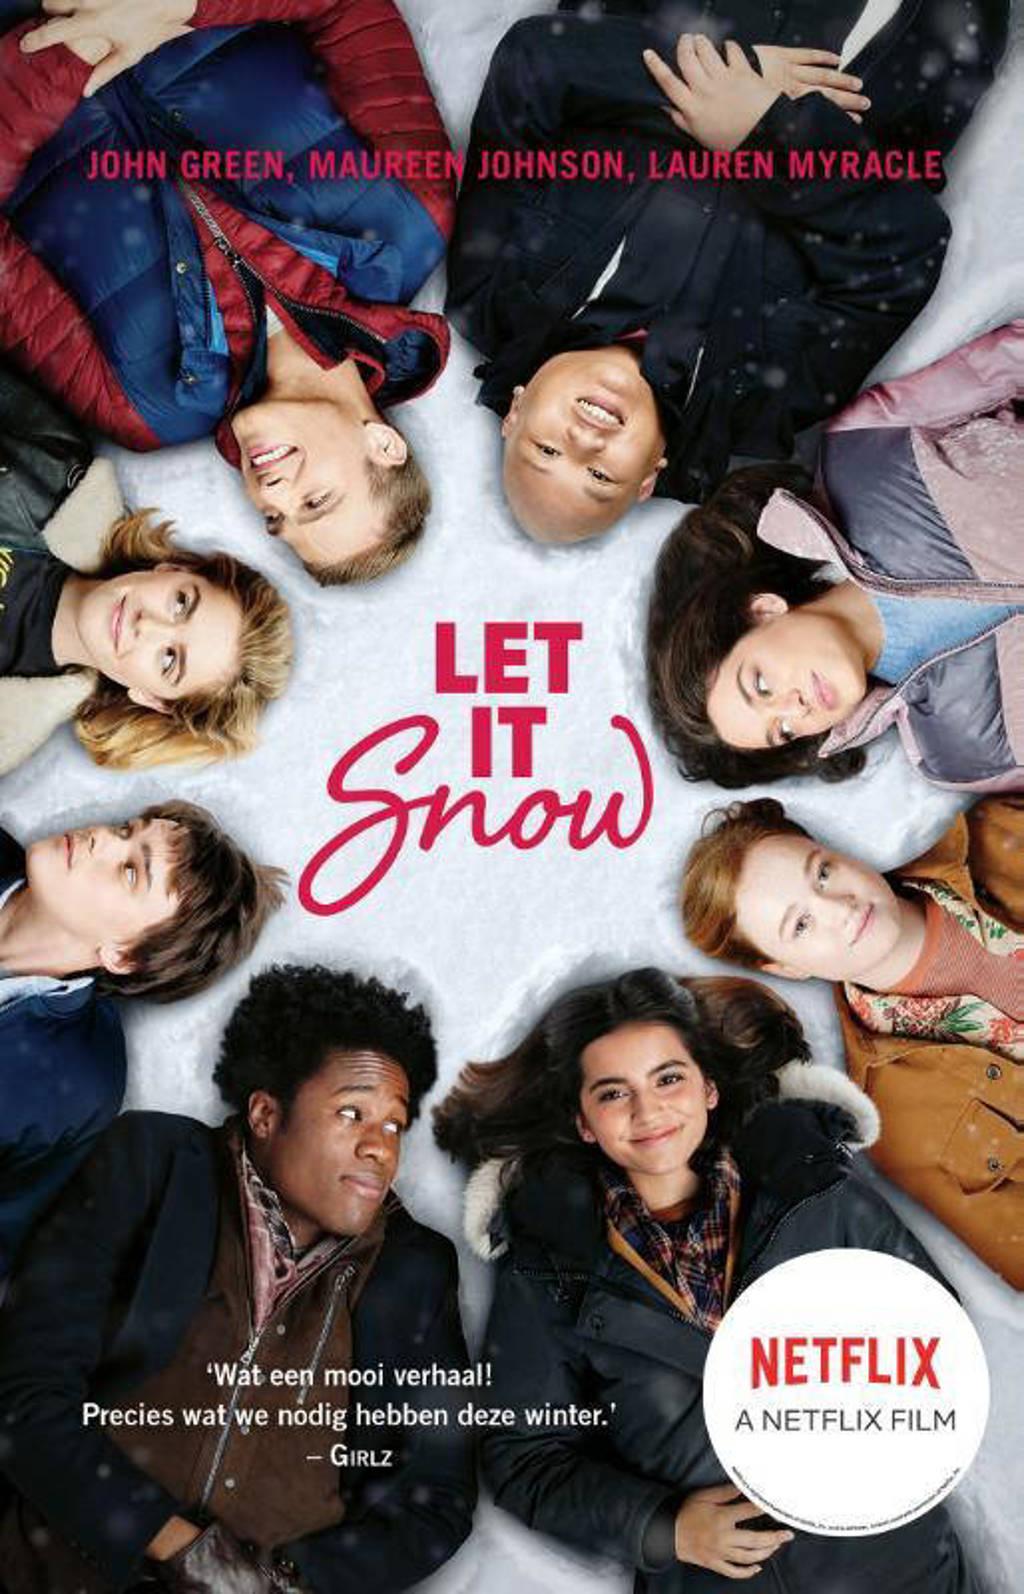 Let it snow - John Green, Maureen Johnson en Lauren Myracie